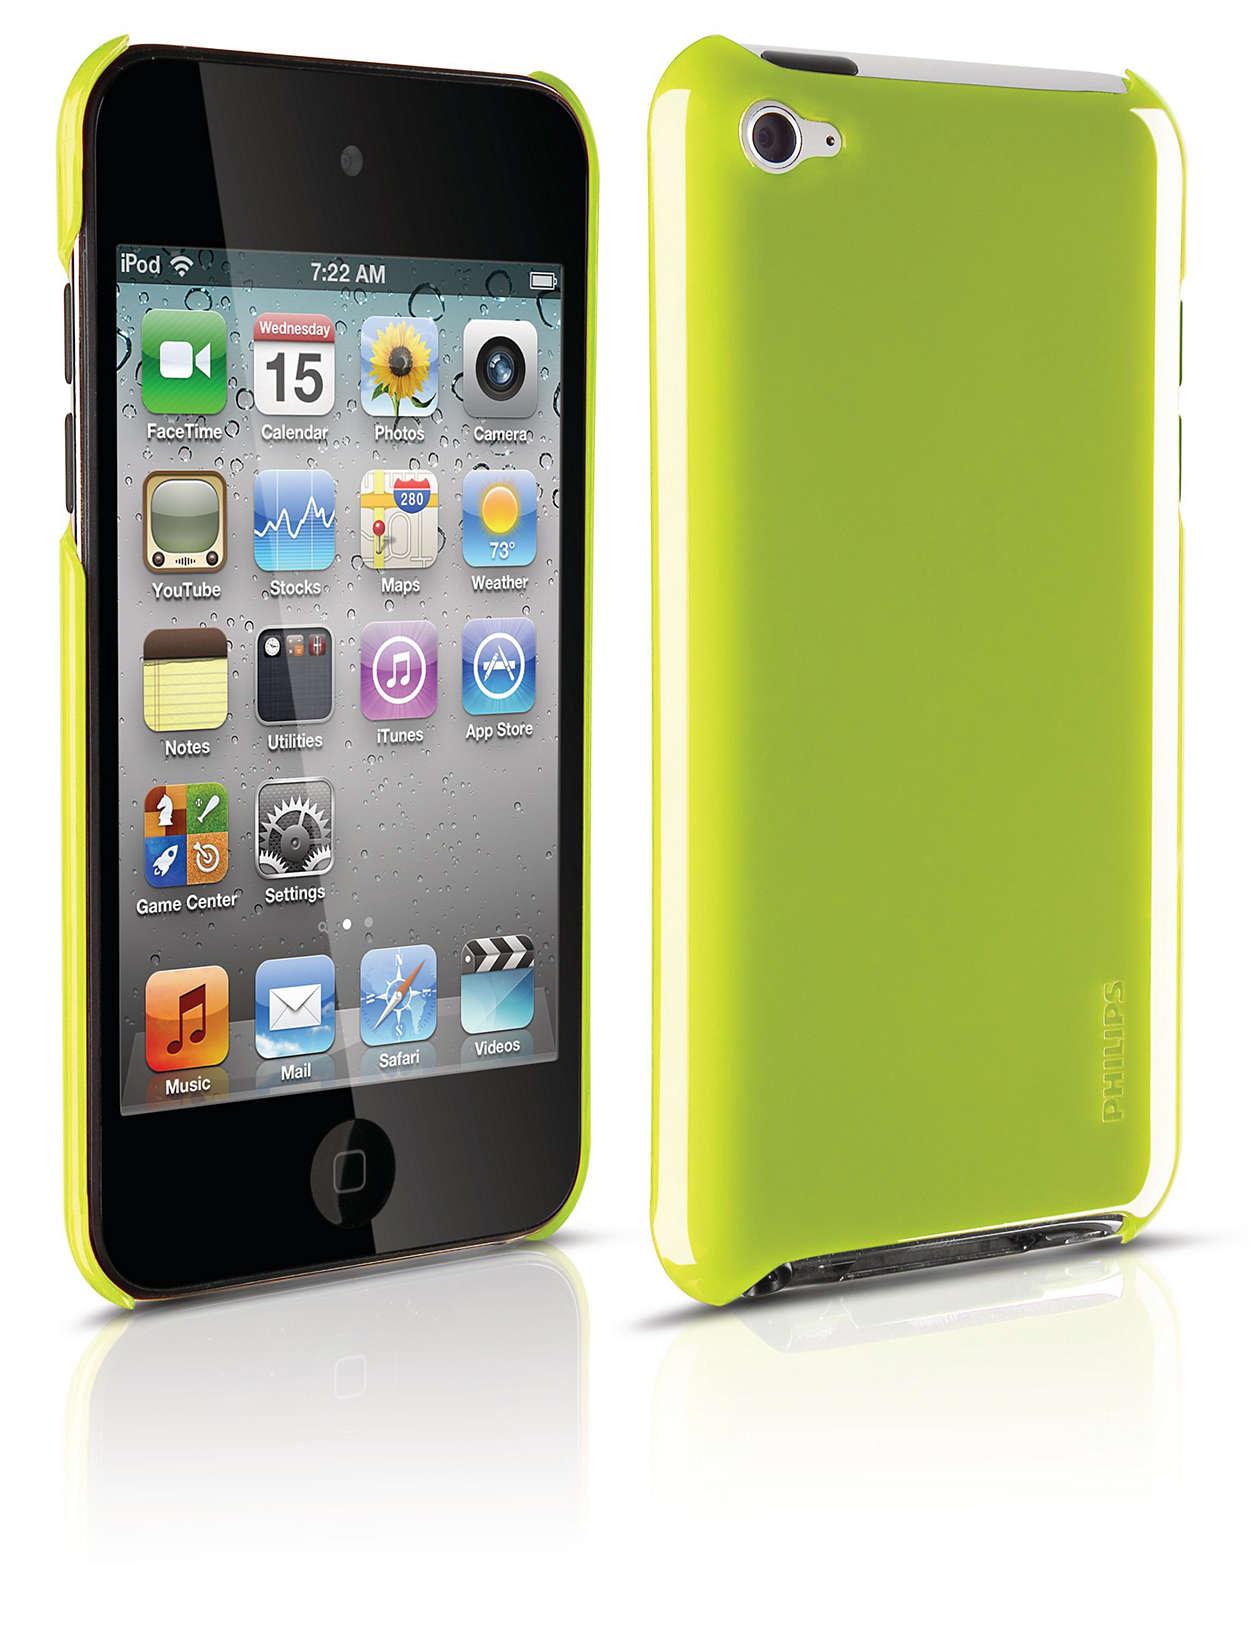 Защитите iPod при помощи жесткого чехла